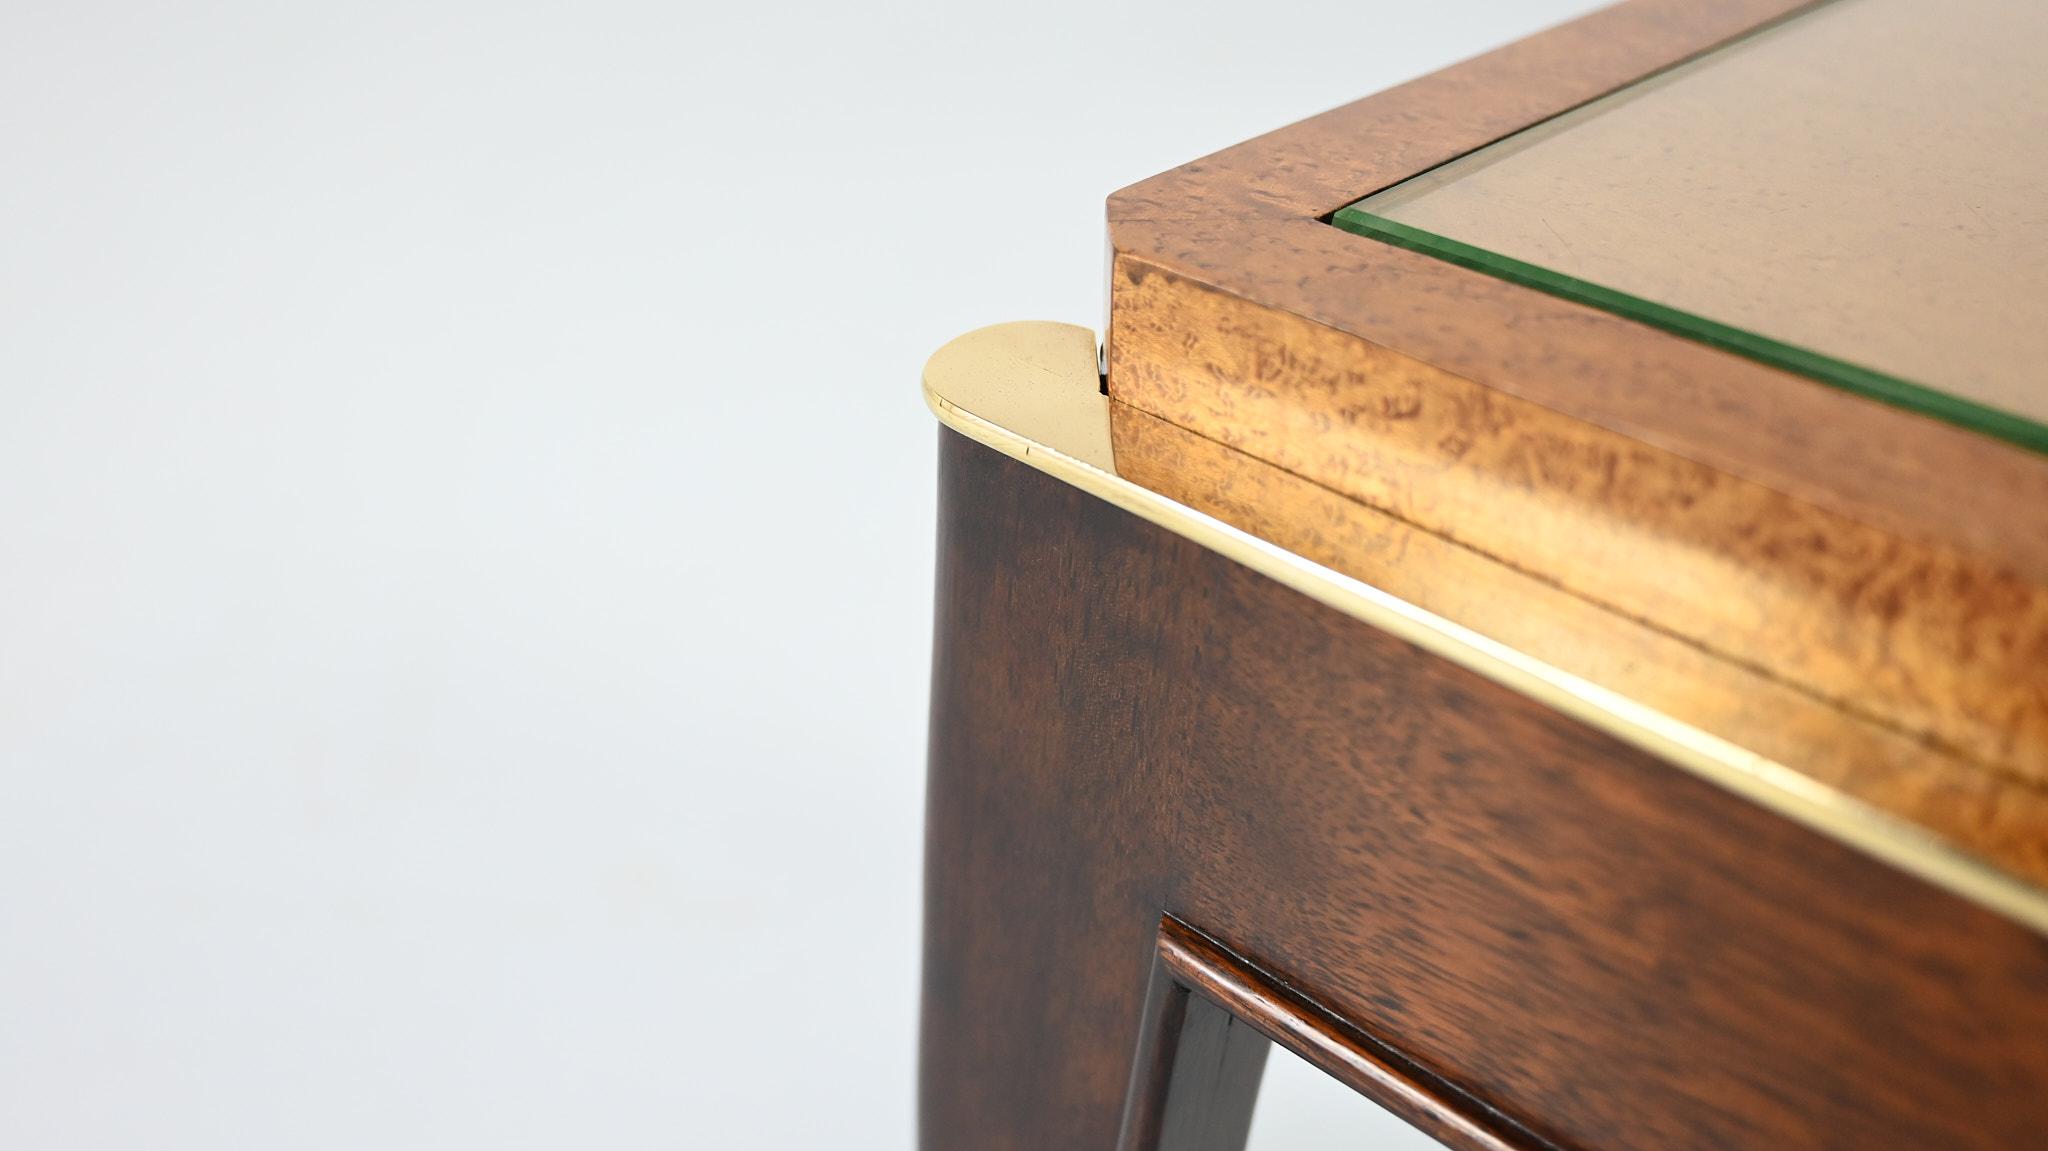 de coene freres ateliers d'art de courtrai art deco chevets nightstand side table